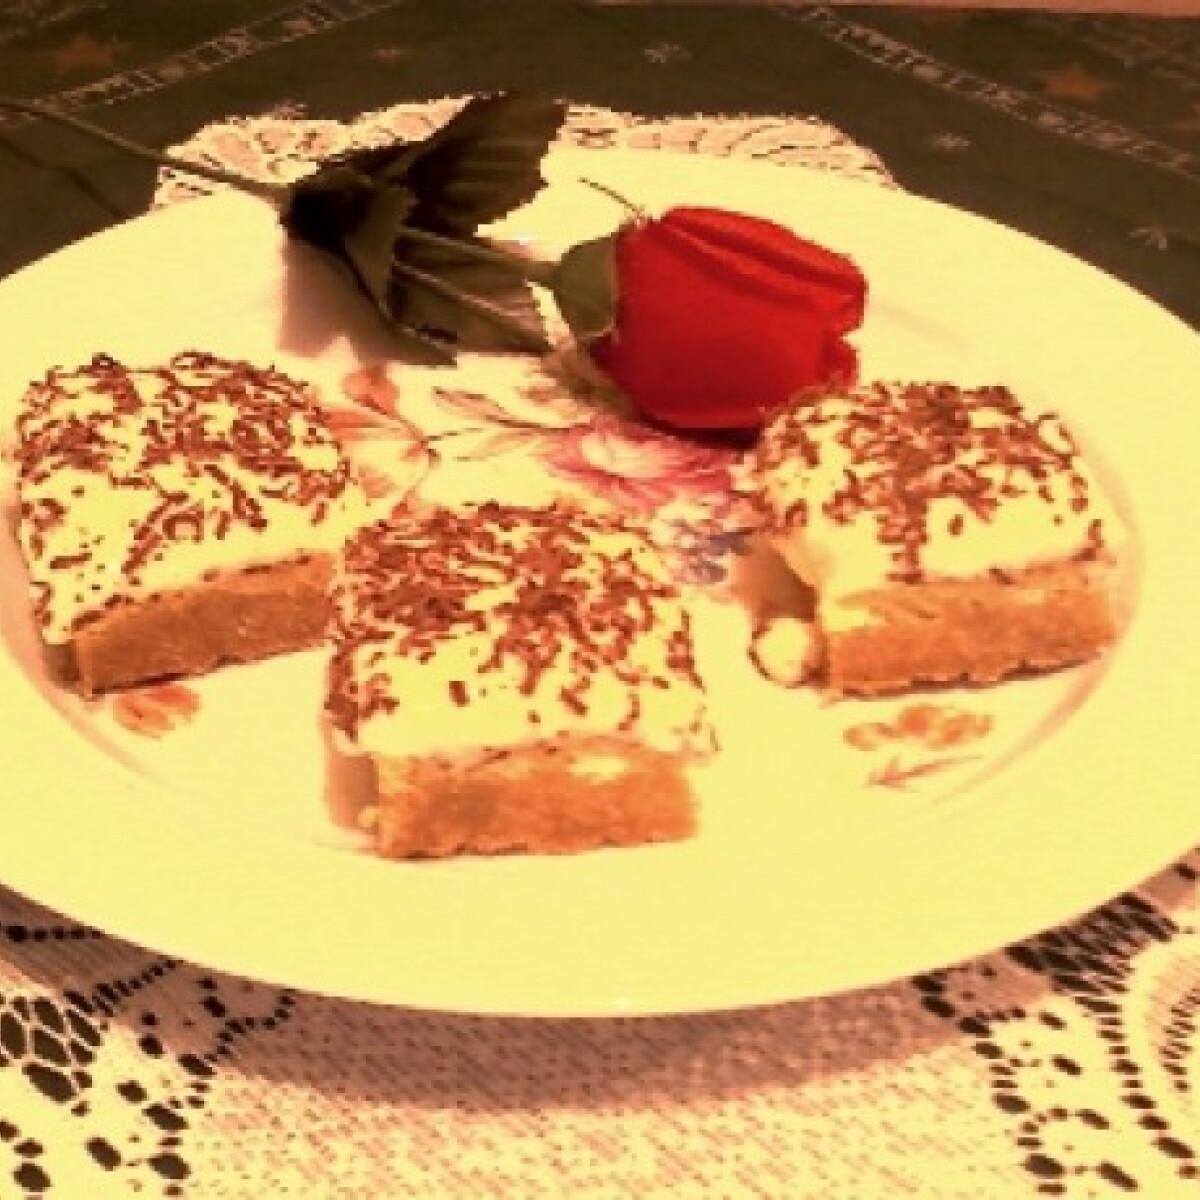 Túrós sütemény Irénce konyhájából